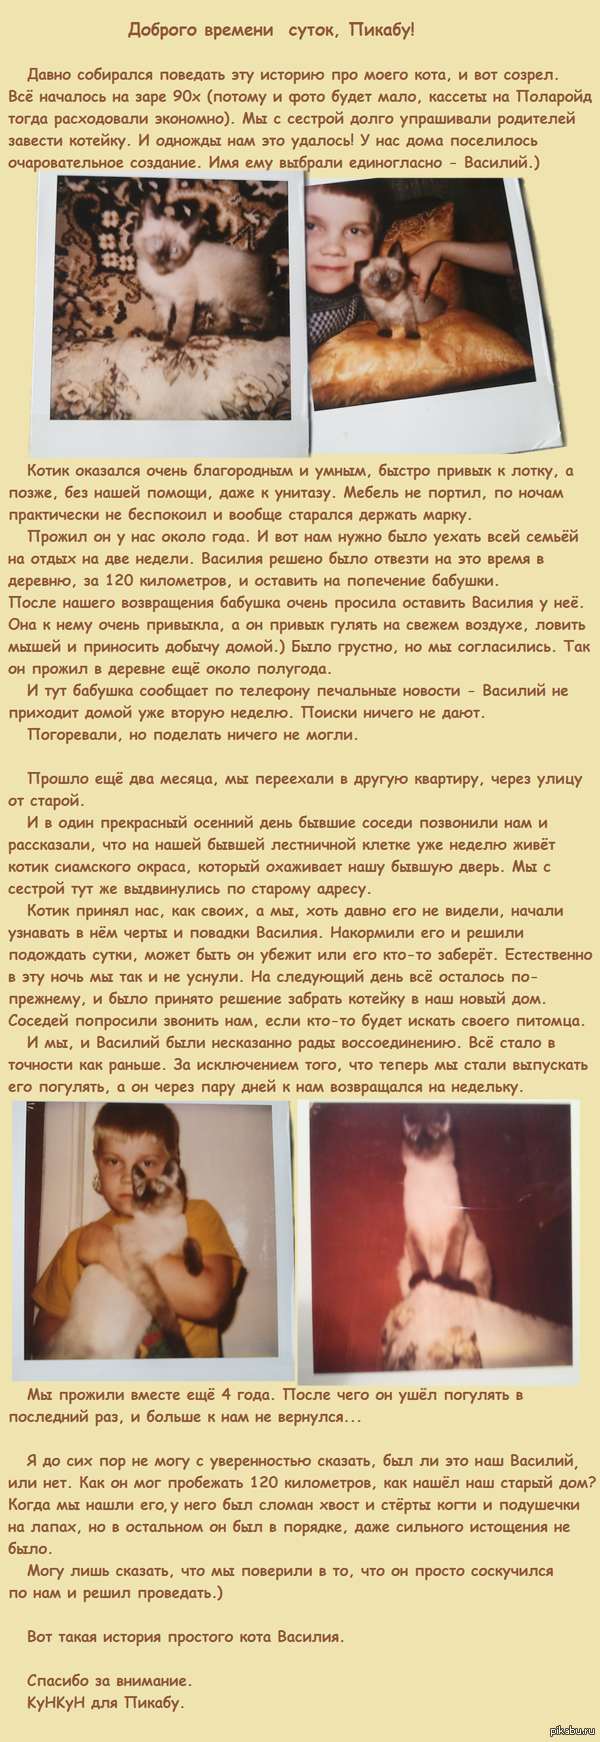 История кота Василия